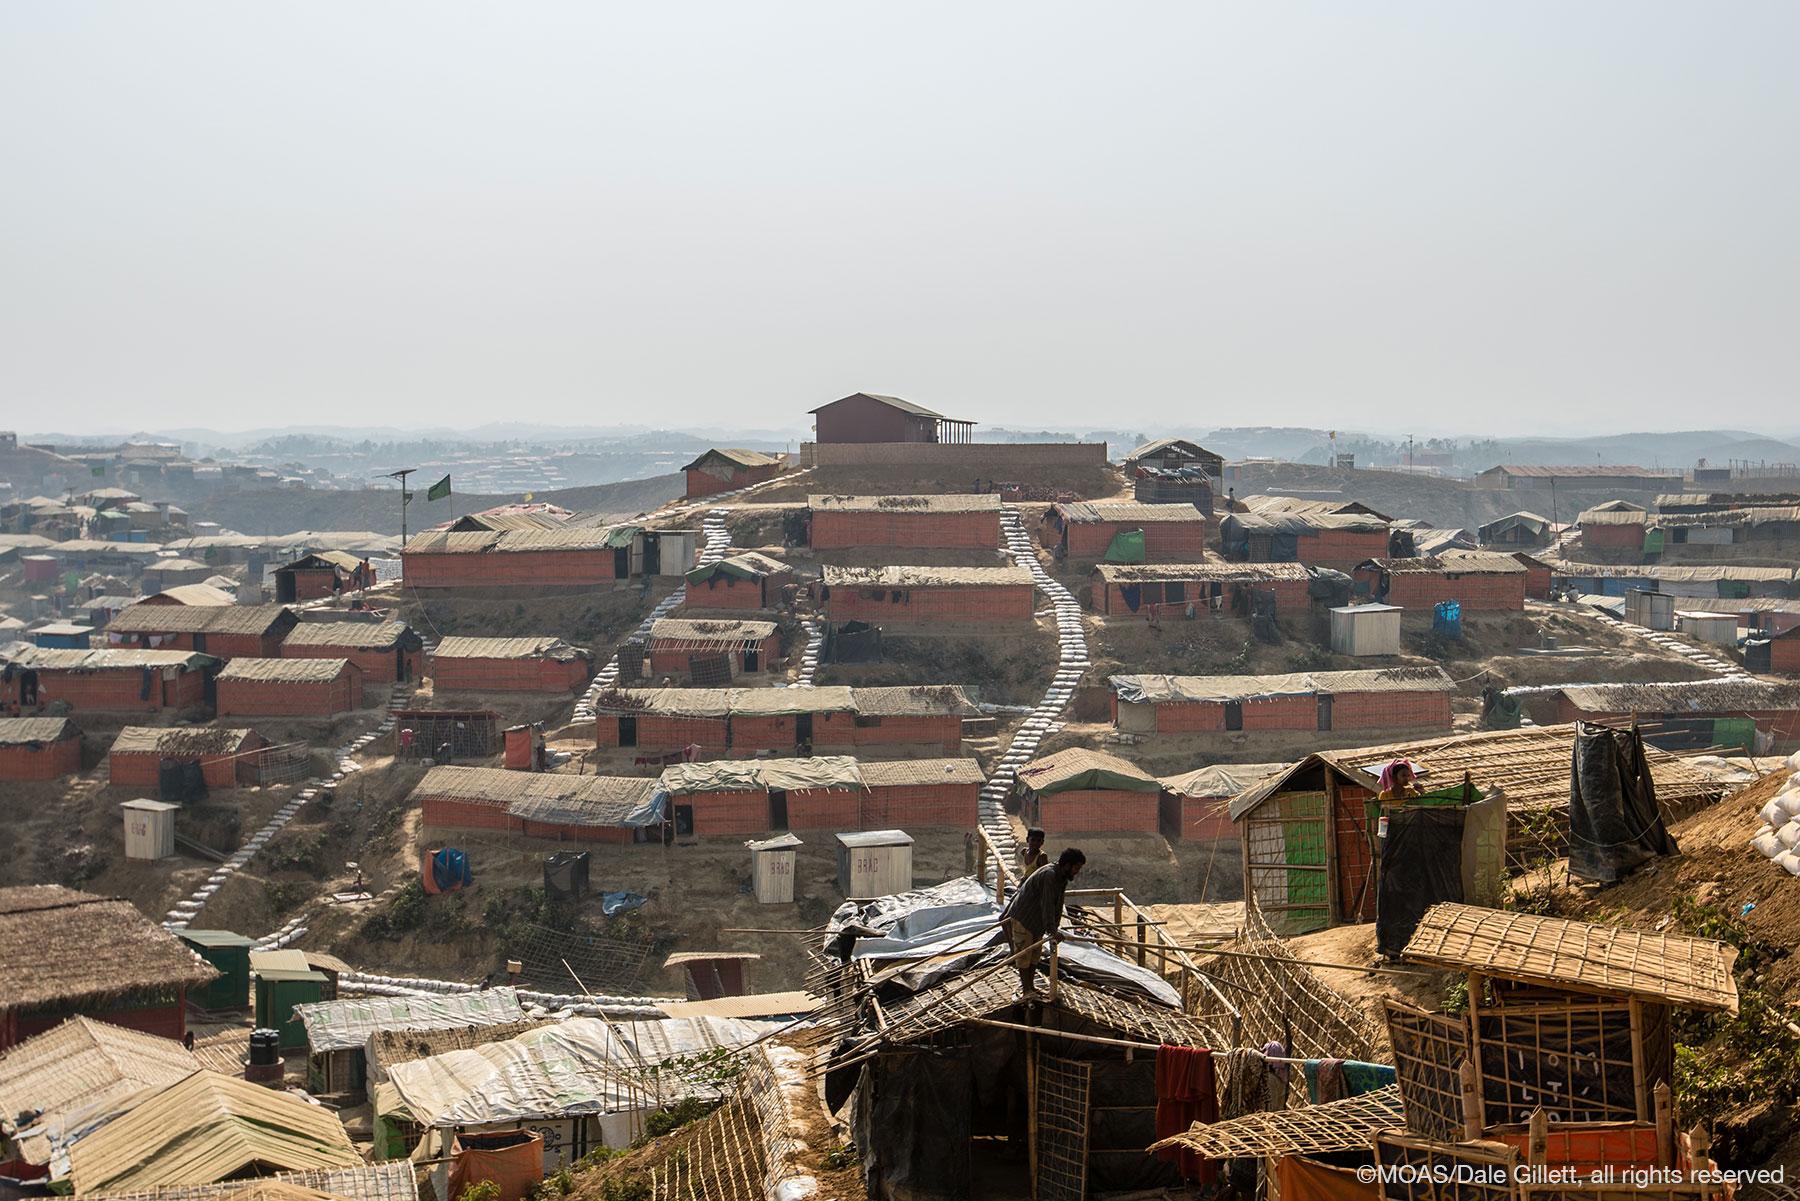 kutupalong-refugee-camp-bangladesh-09151_copyright_MOAS_Dale-Gillett (1)